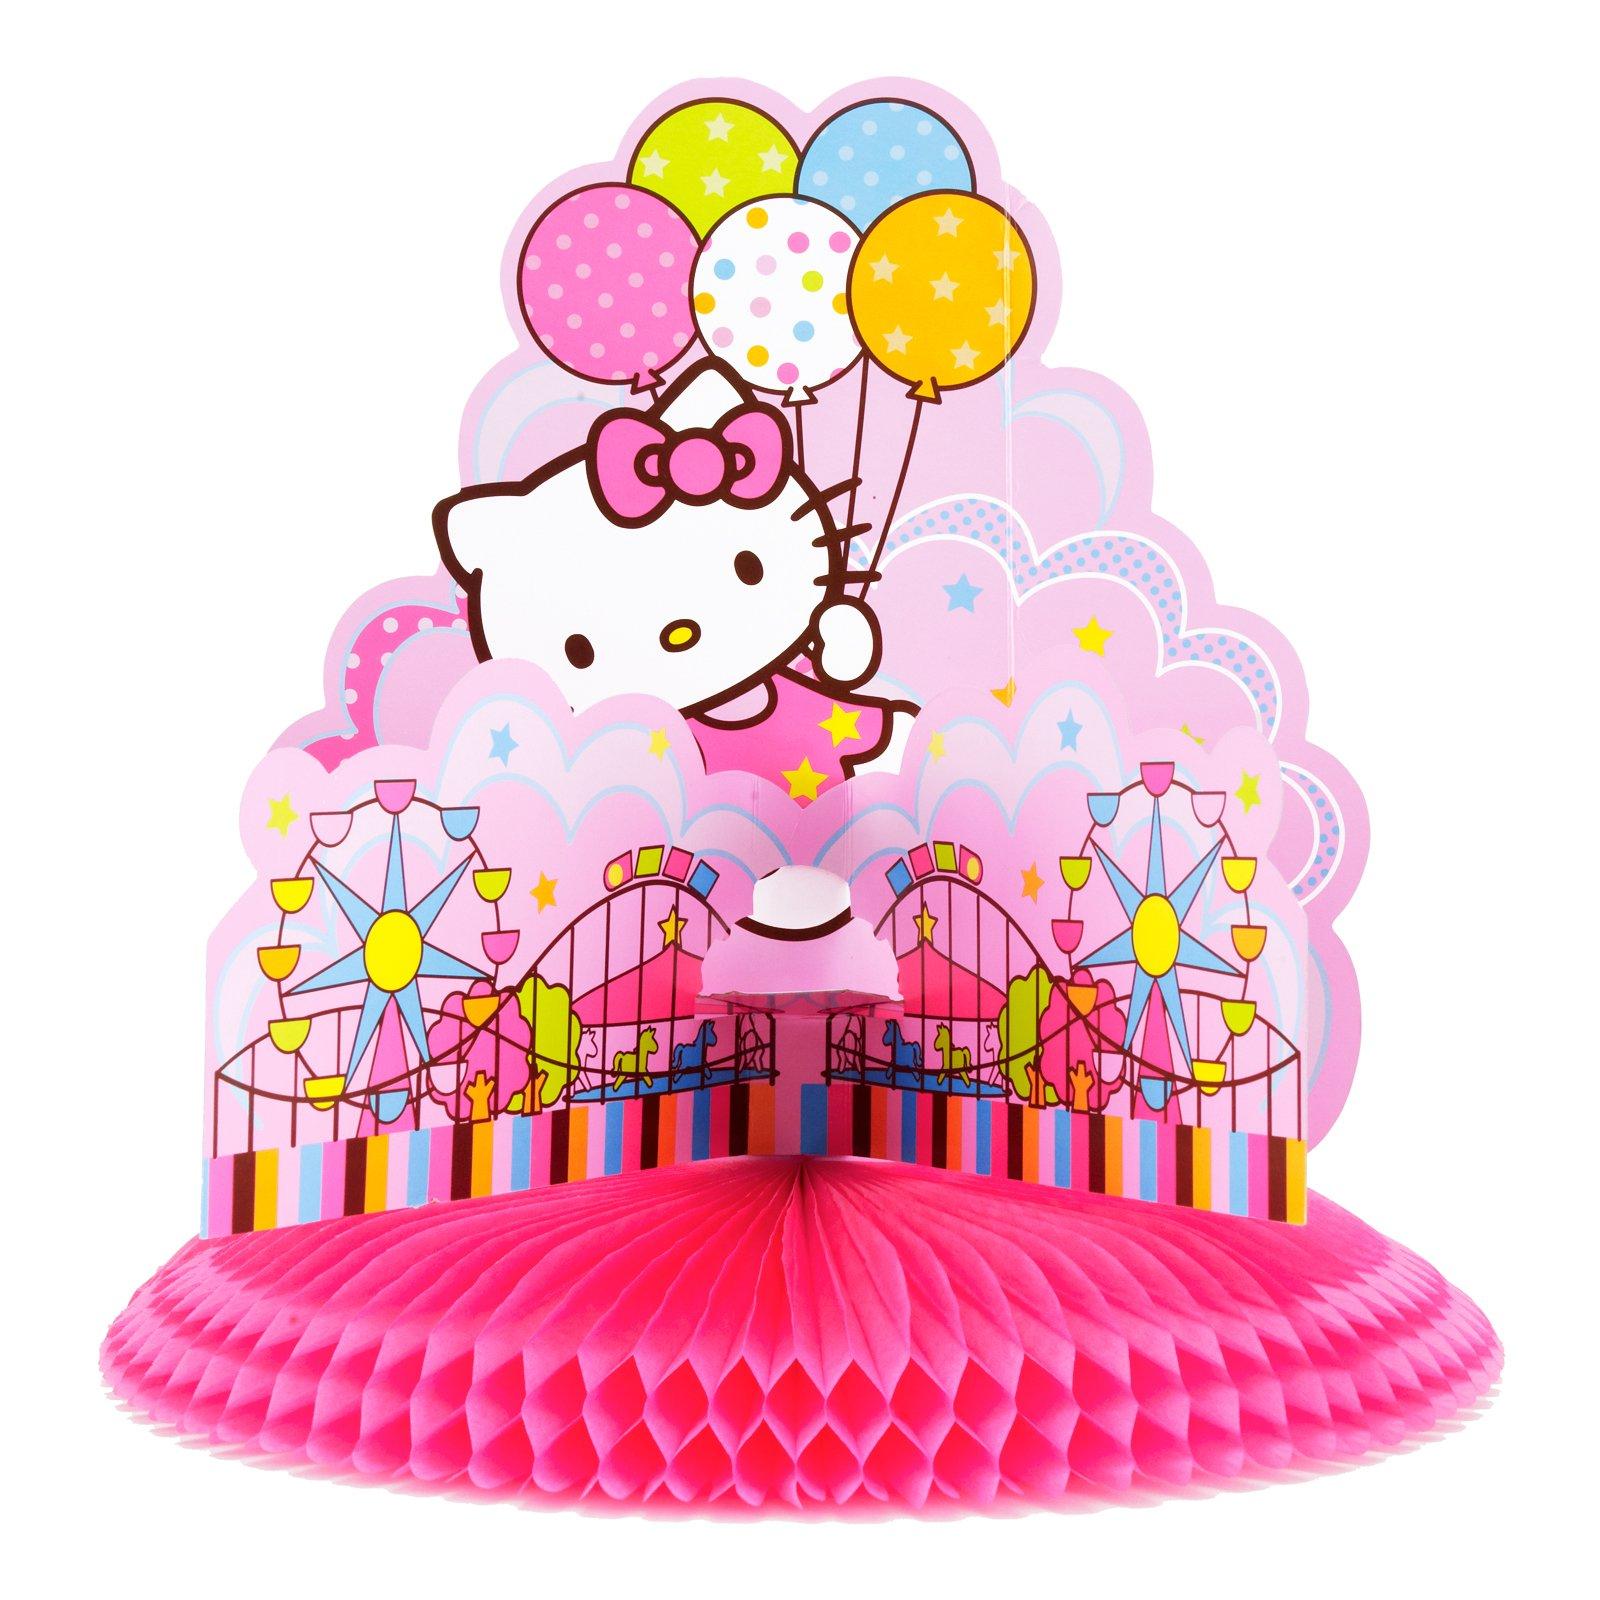 Where Can I Buy A Hello Kitty Birthday Cake